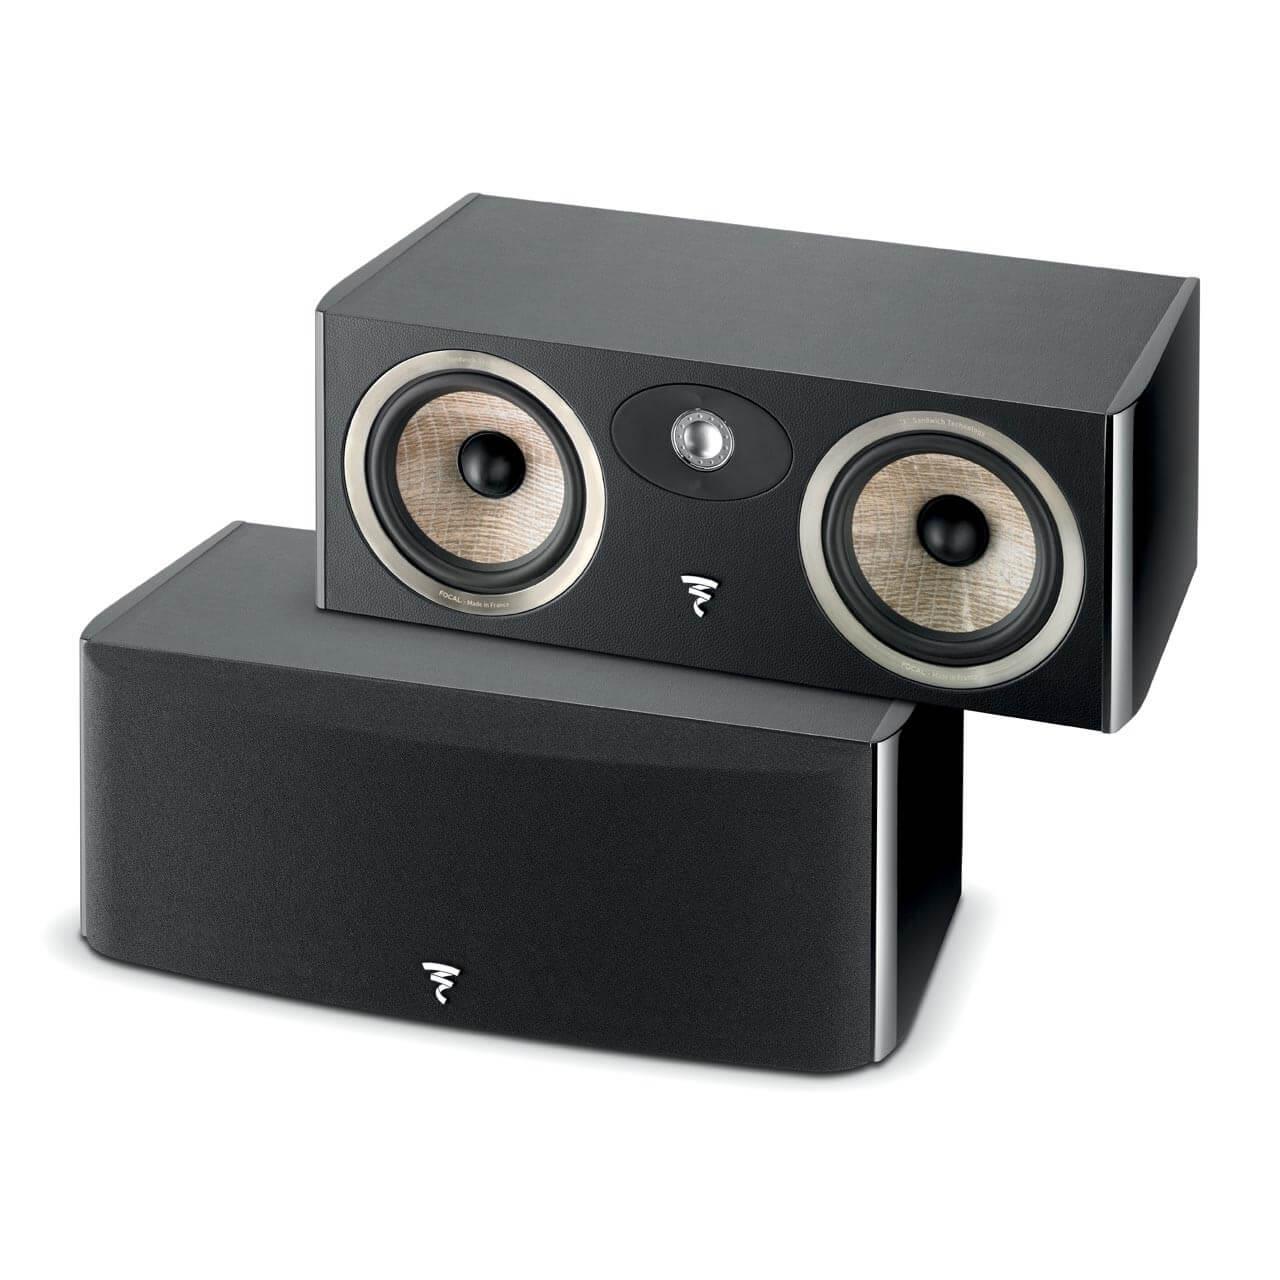 FOCAL ARIA CC900 Bocina central, bass-Reflex 2 vias, potencia 40-200w, impedancia 8Ohms, pieza